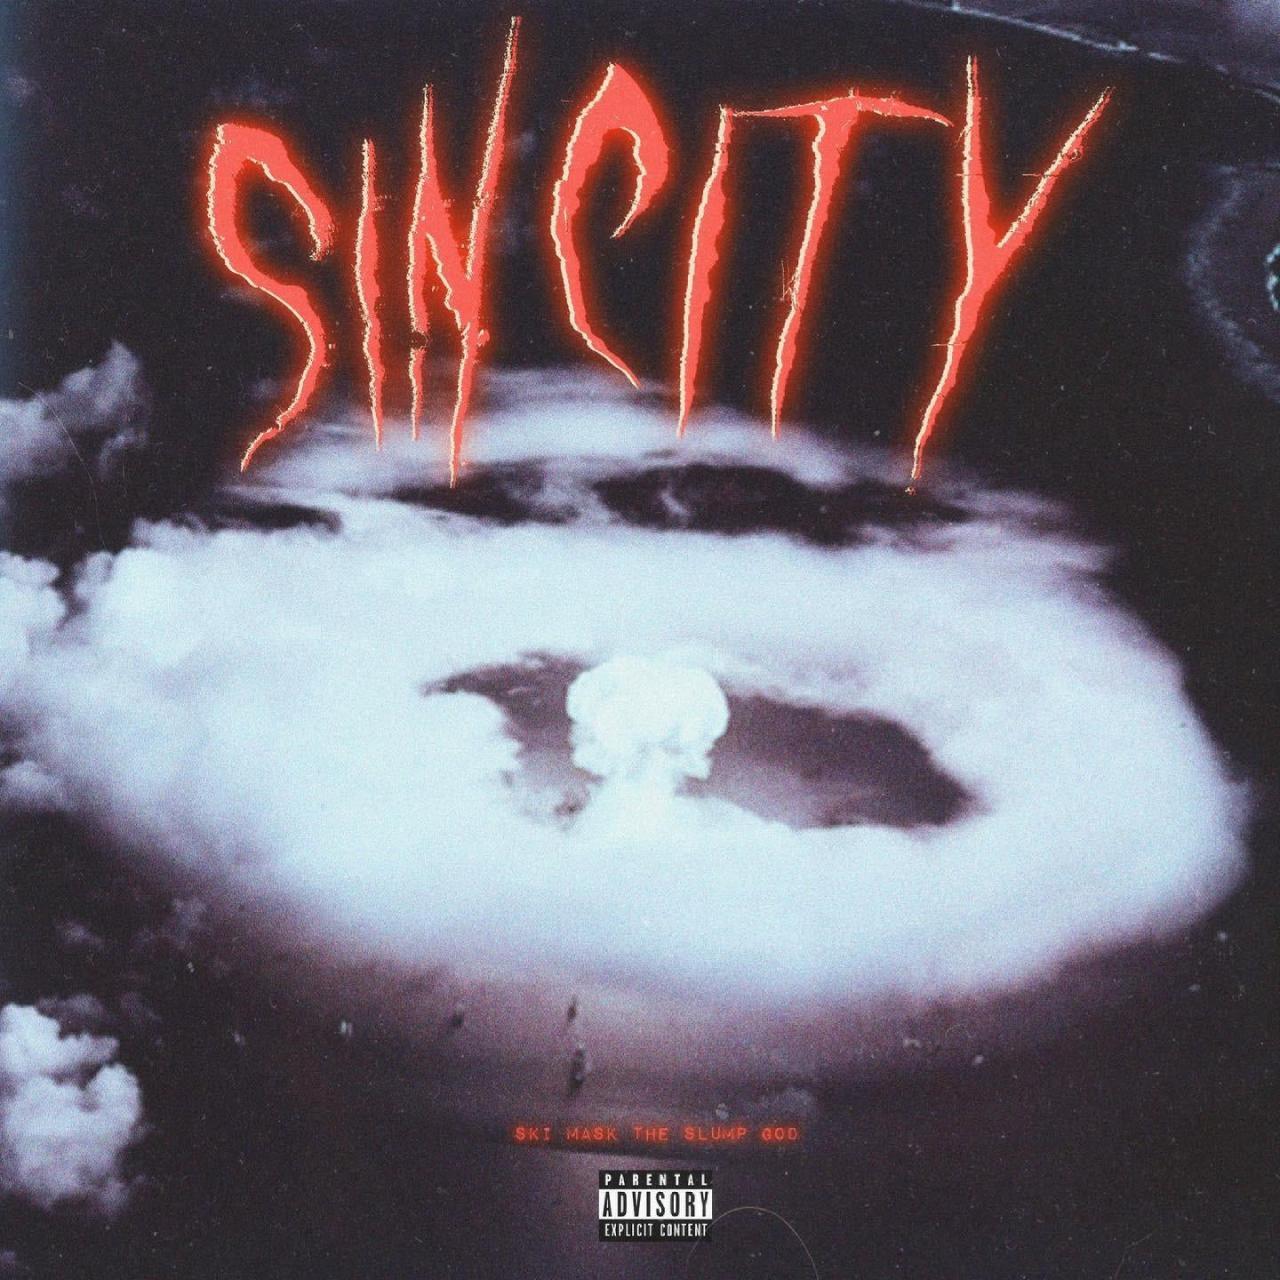 Ski Mask the Slump God - Sin City Album ZIP DOWNLOAD